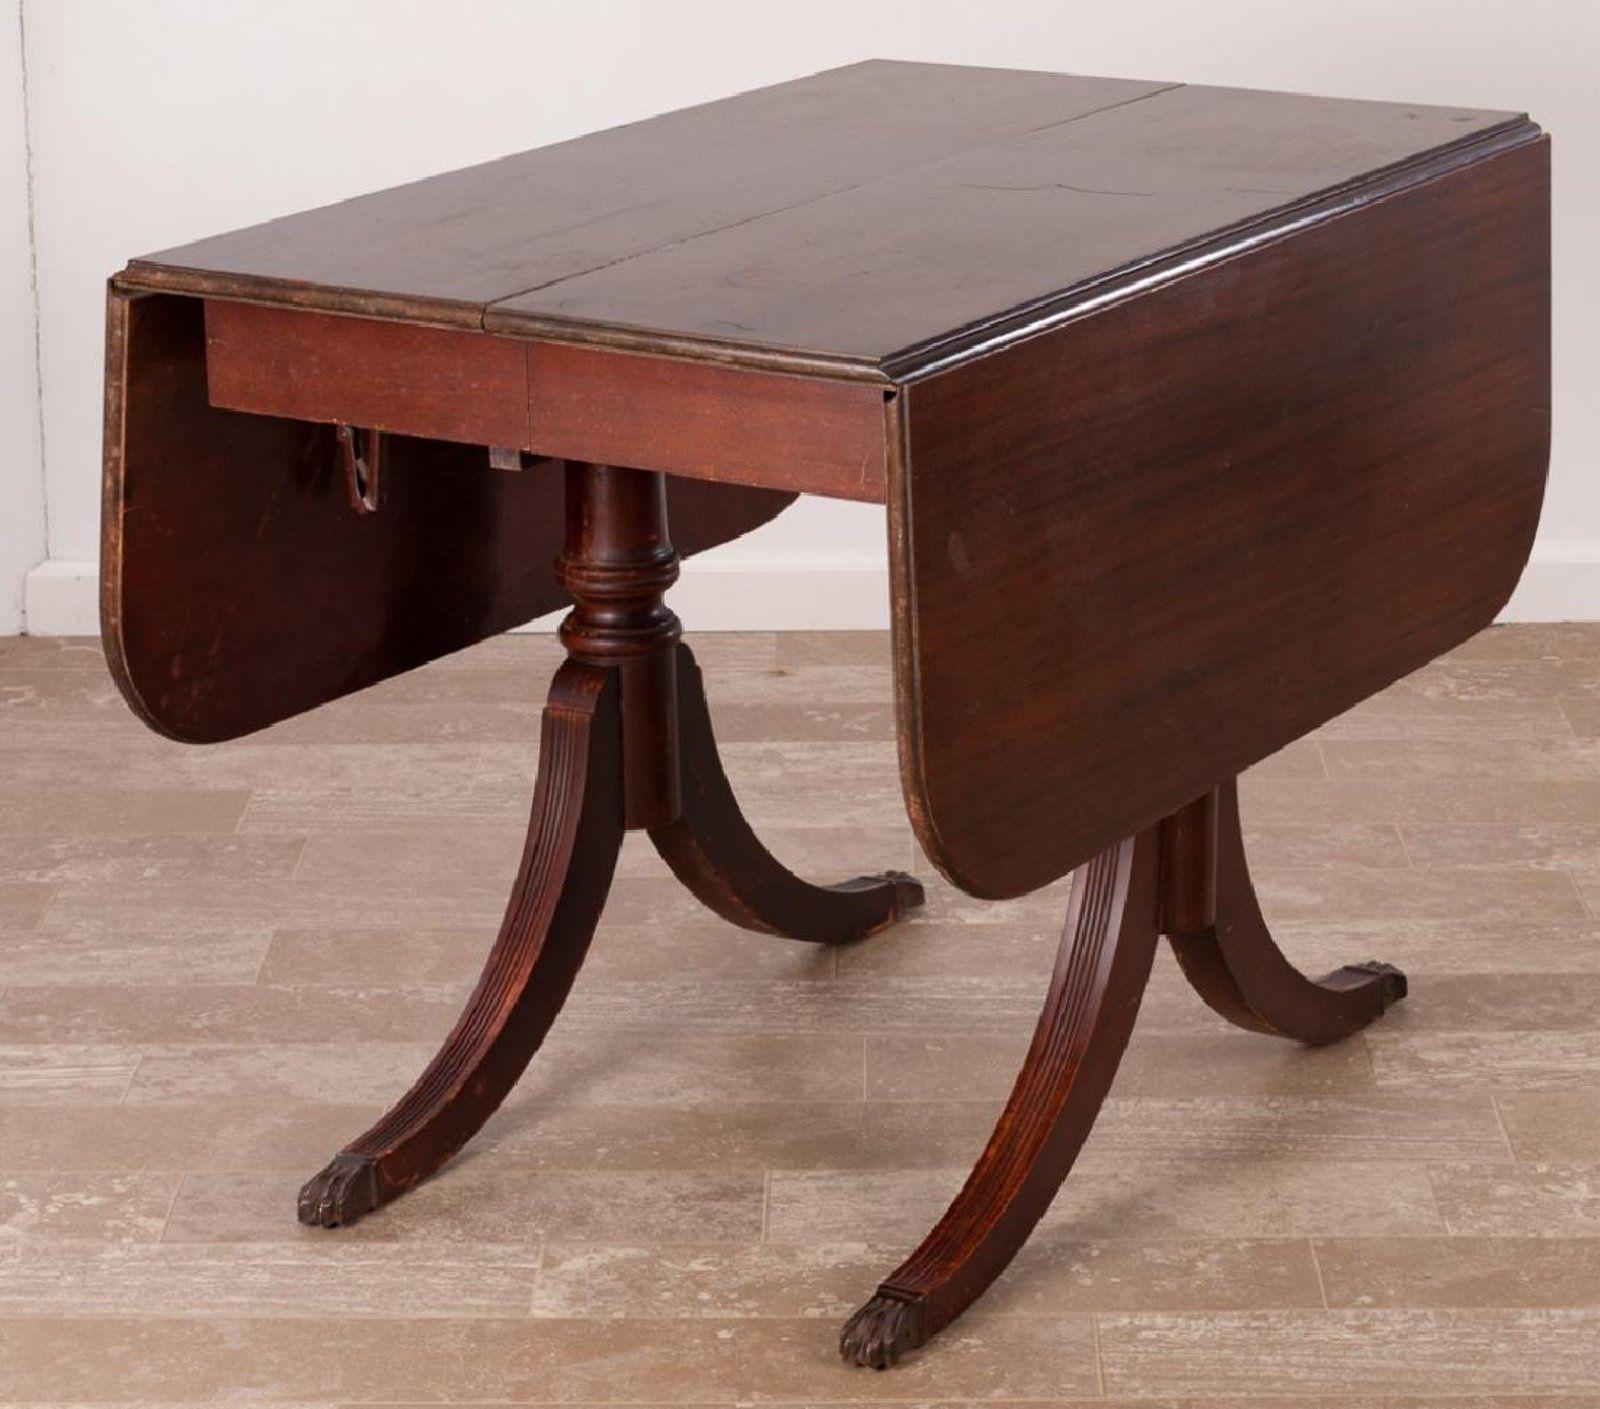 Brandt Duncan Phyfe Style Drop Leaf Table Jul 22 2017 Bremo Auctions In Va Drop Leaf Table Leaf Table Table